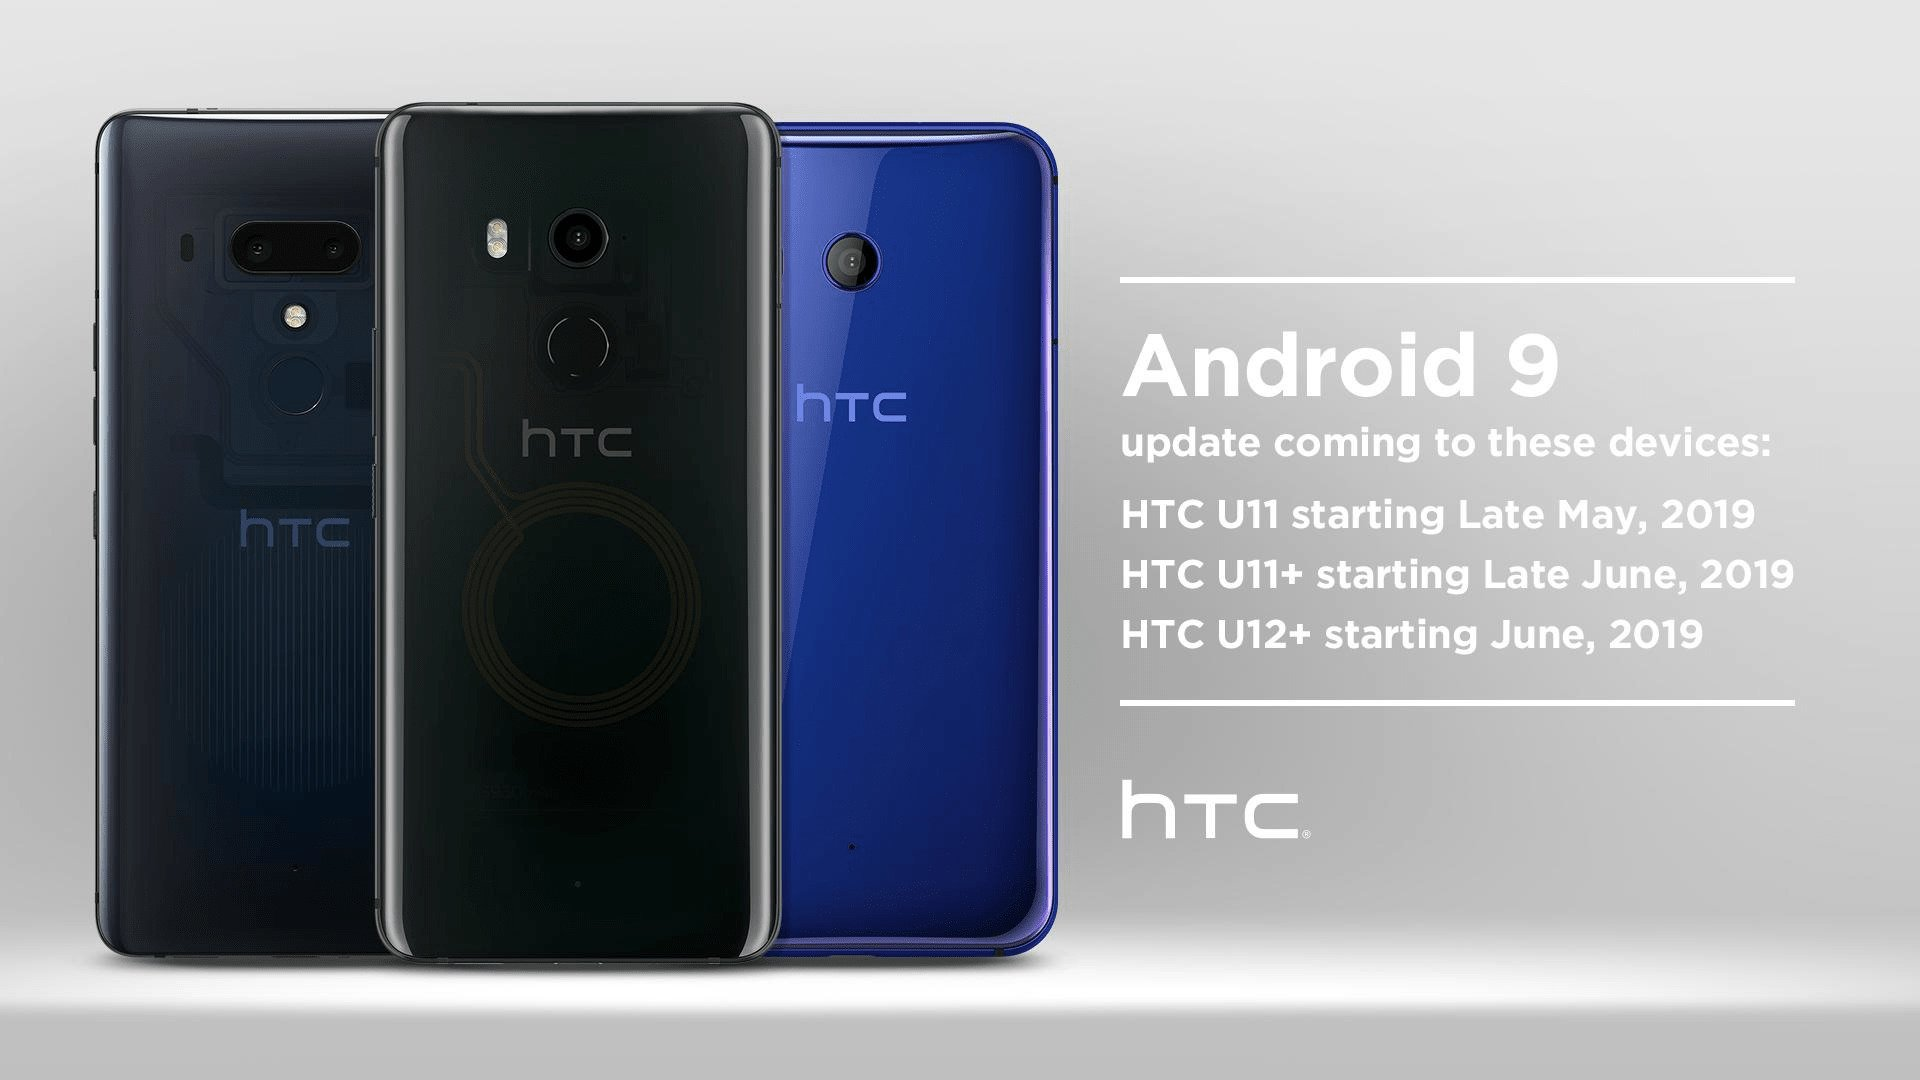 HTC Android Pie Update Timeline for HTC U11, U11+, and U12+